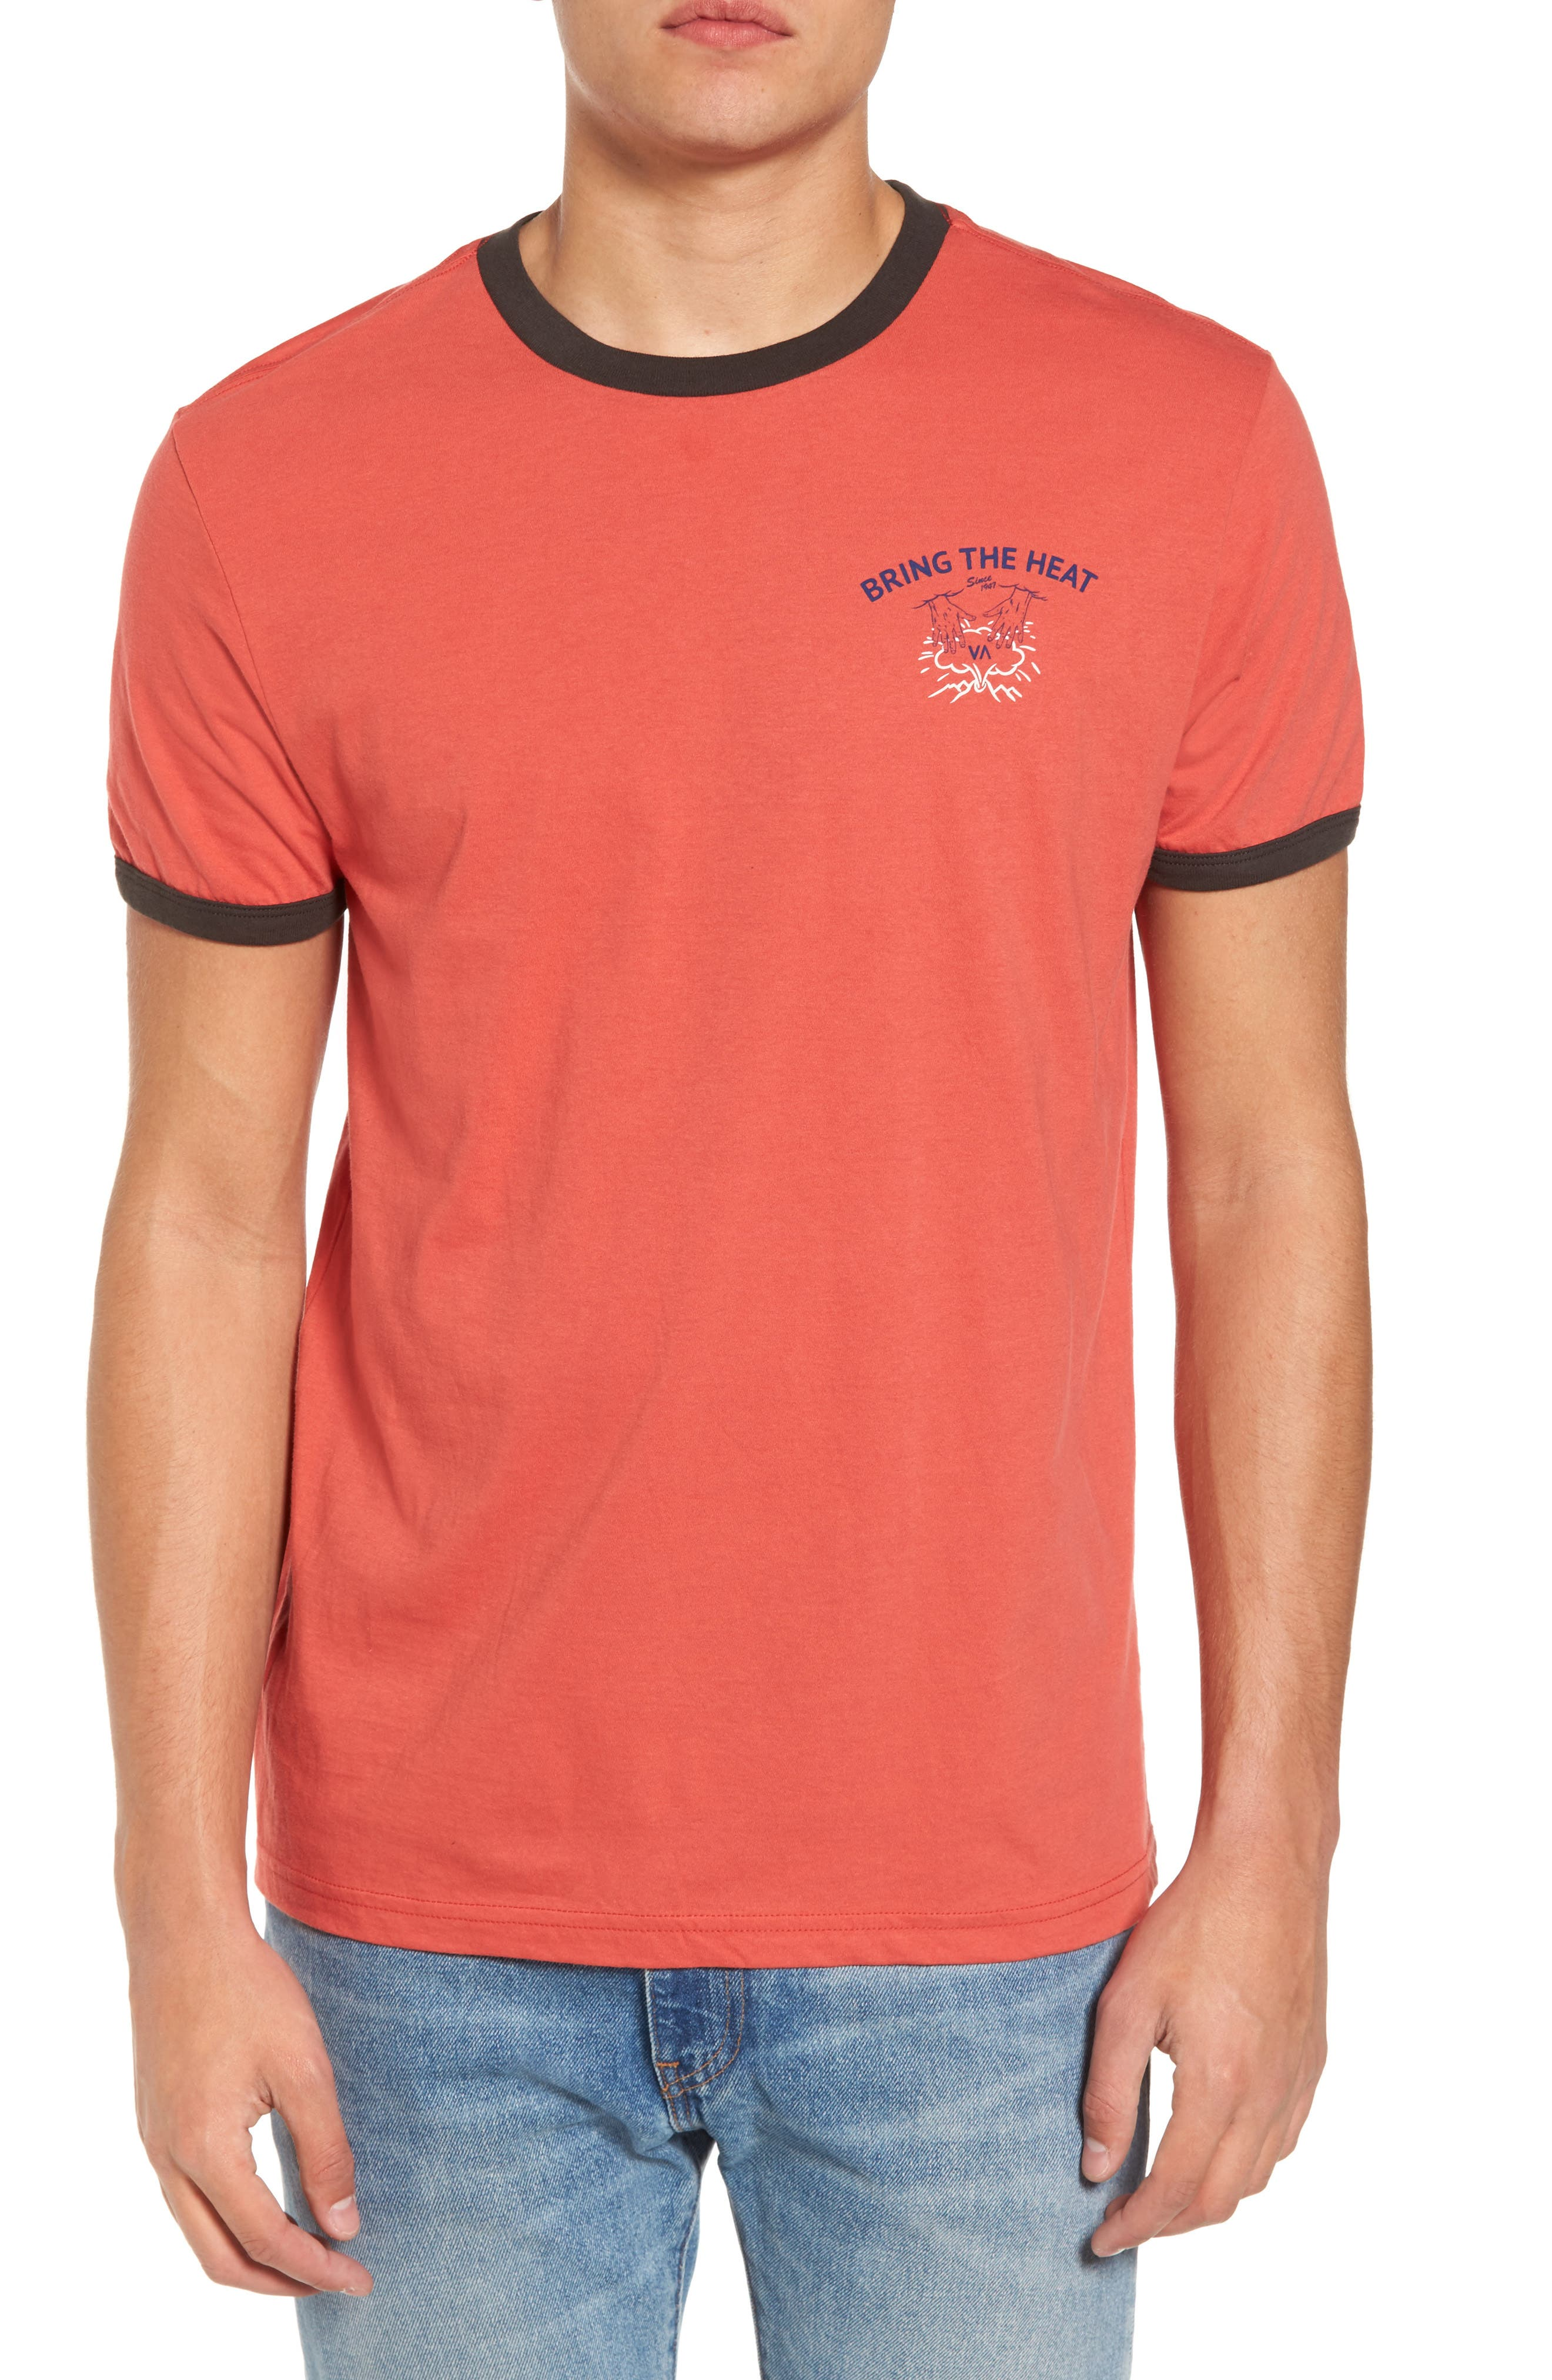 Bringing the Heat T-Shirt,                         Main,                         color, Rosewood